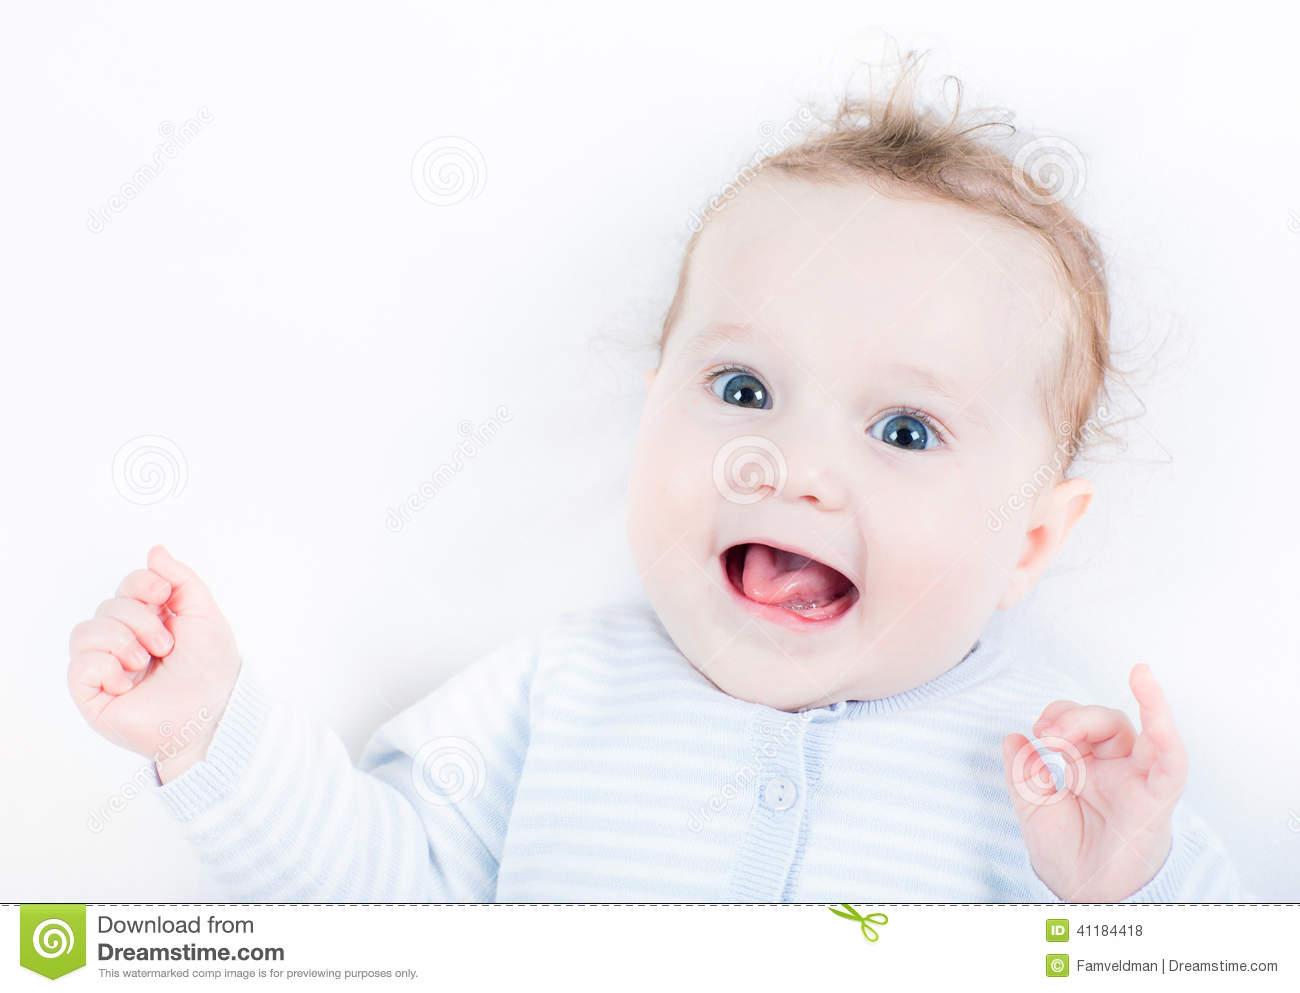 Babys tanzen sehr lustig amp süß!  Babies dancing very